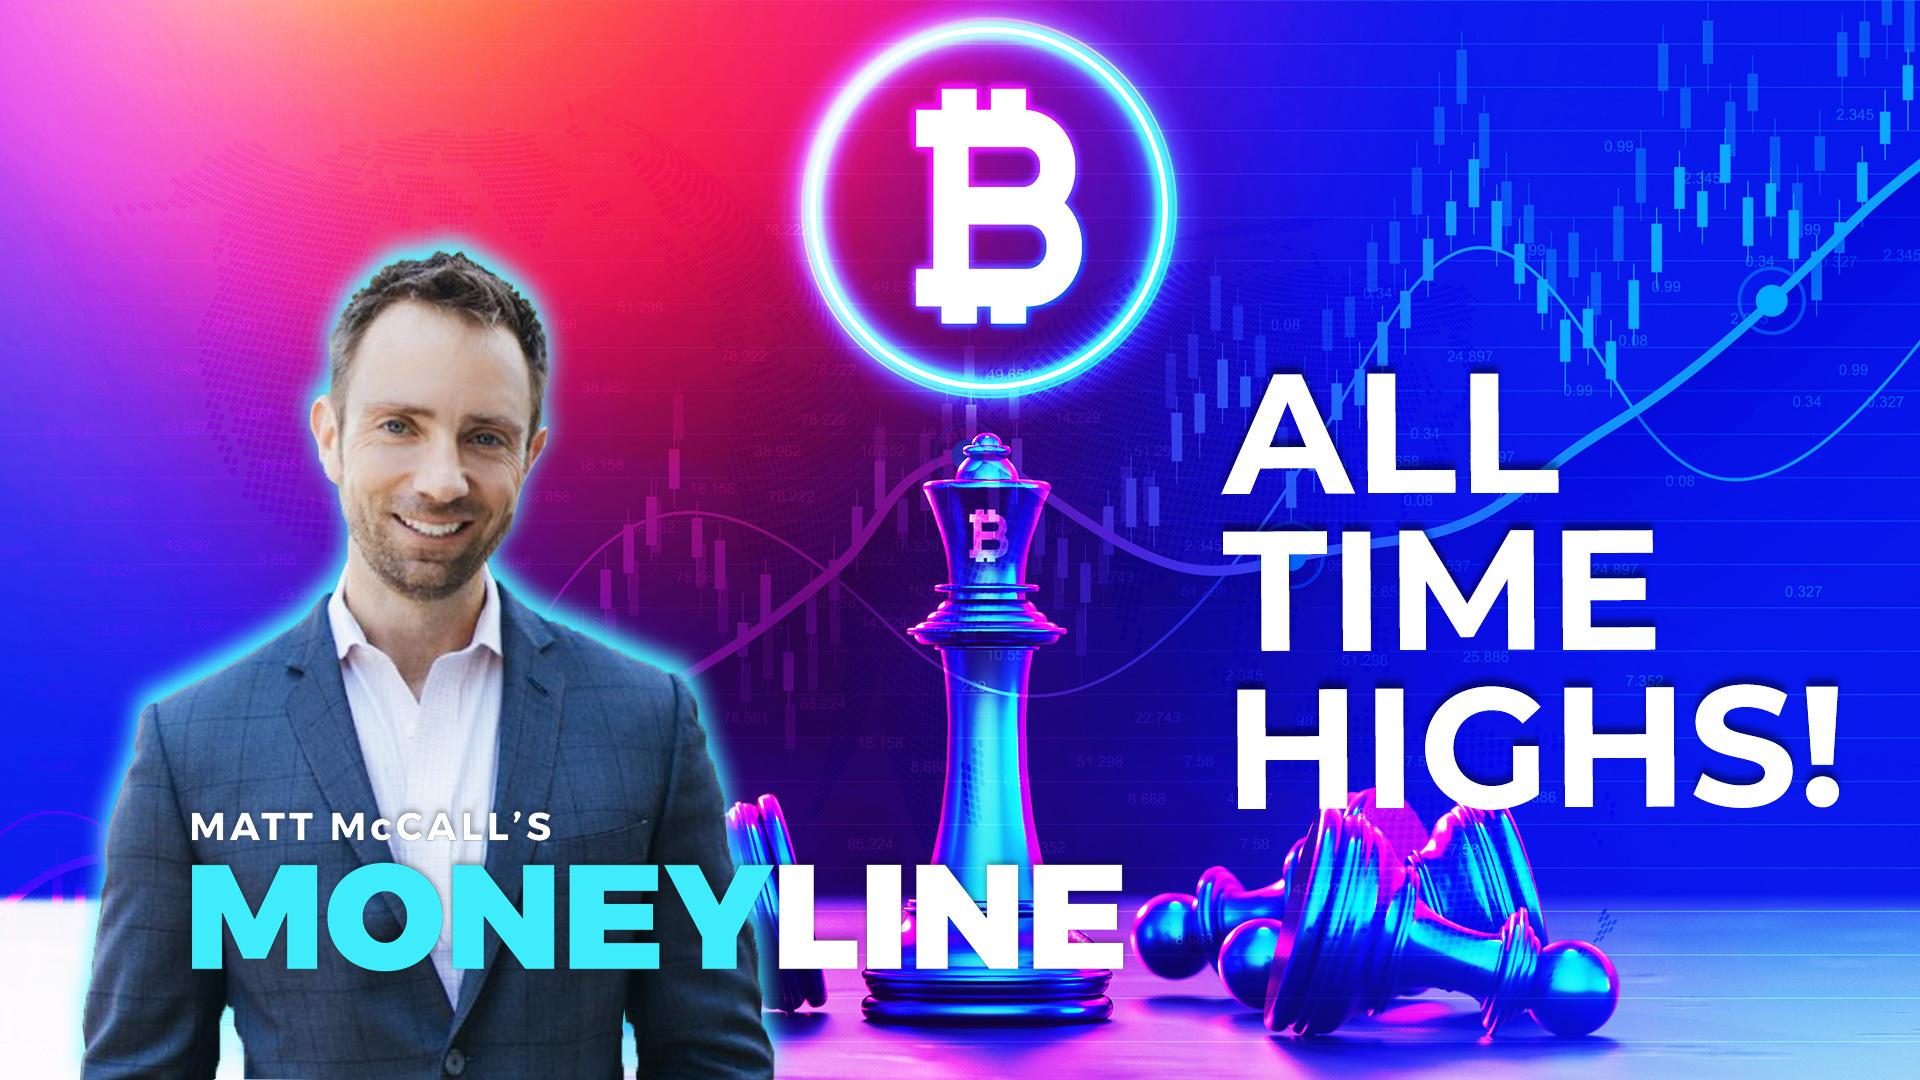 Matt McCall's Moneyline: S&P 500 and Bitcoin Both Hit All-Time Highs